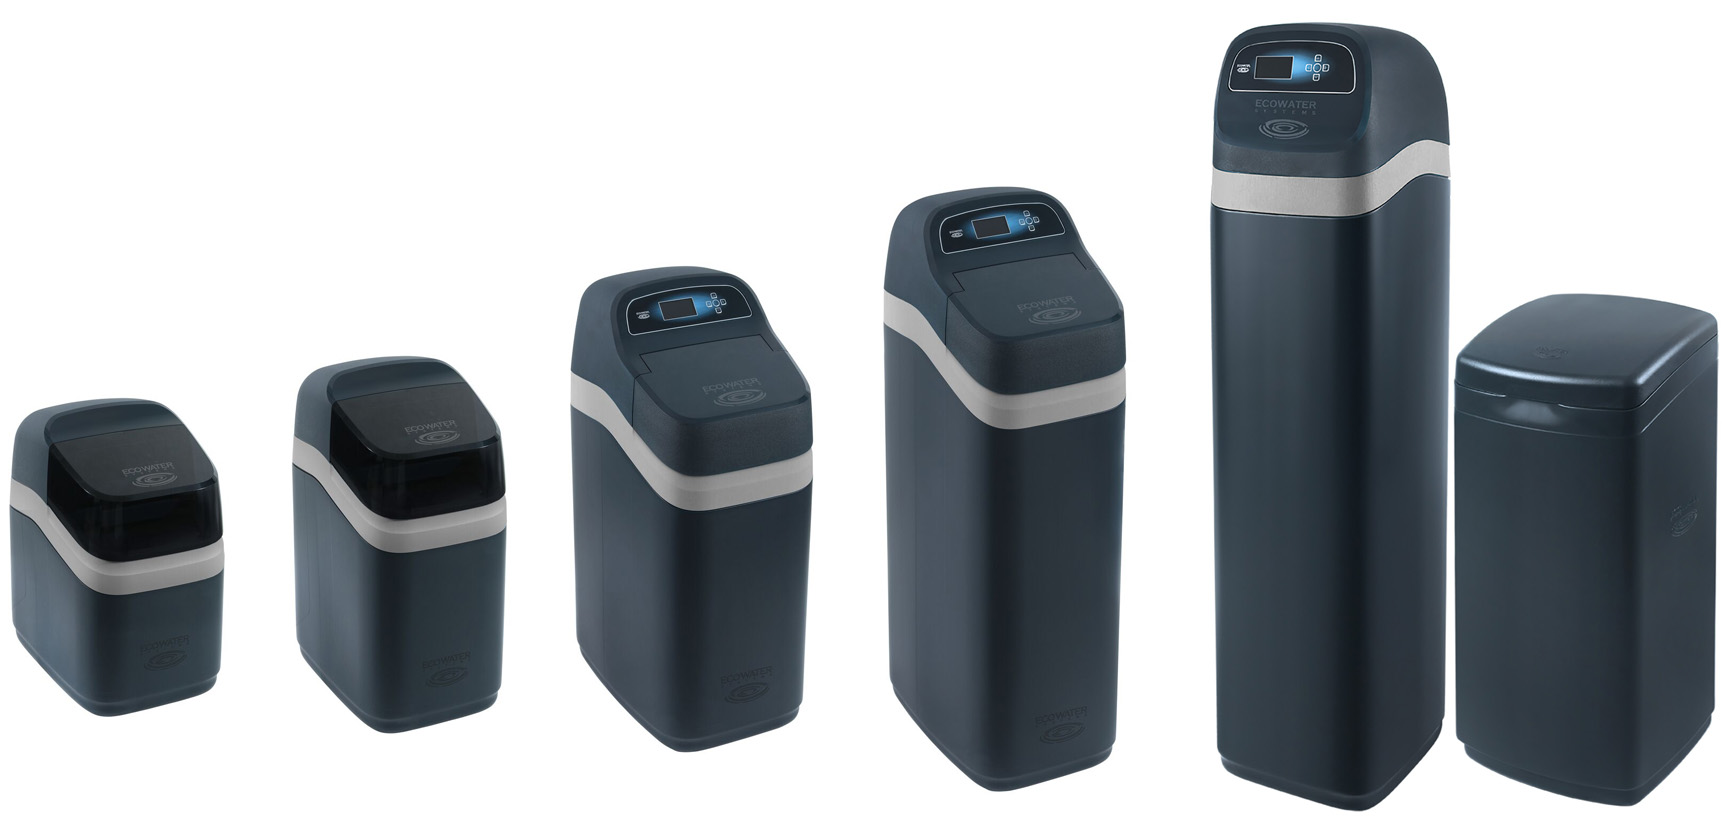 Eco Water Softner